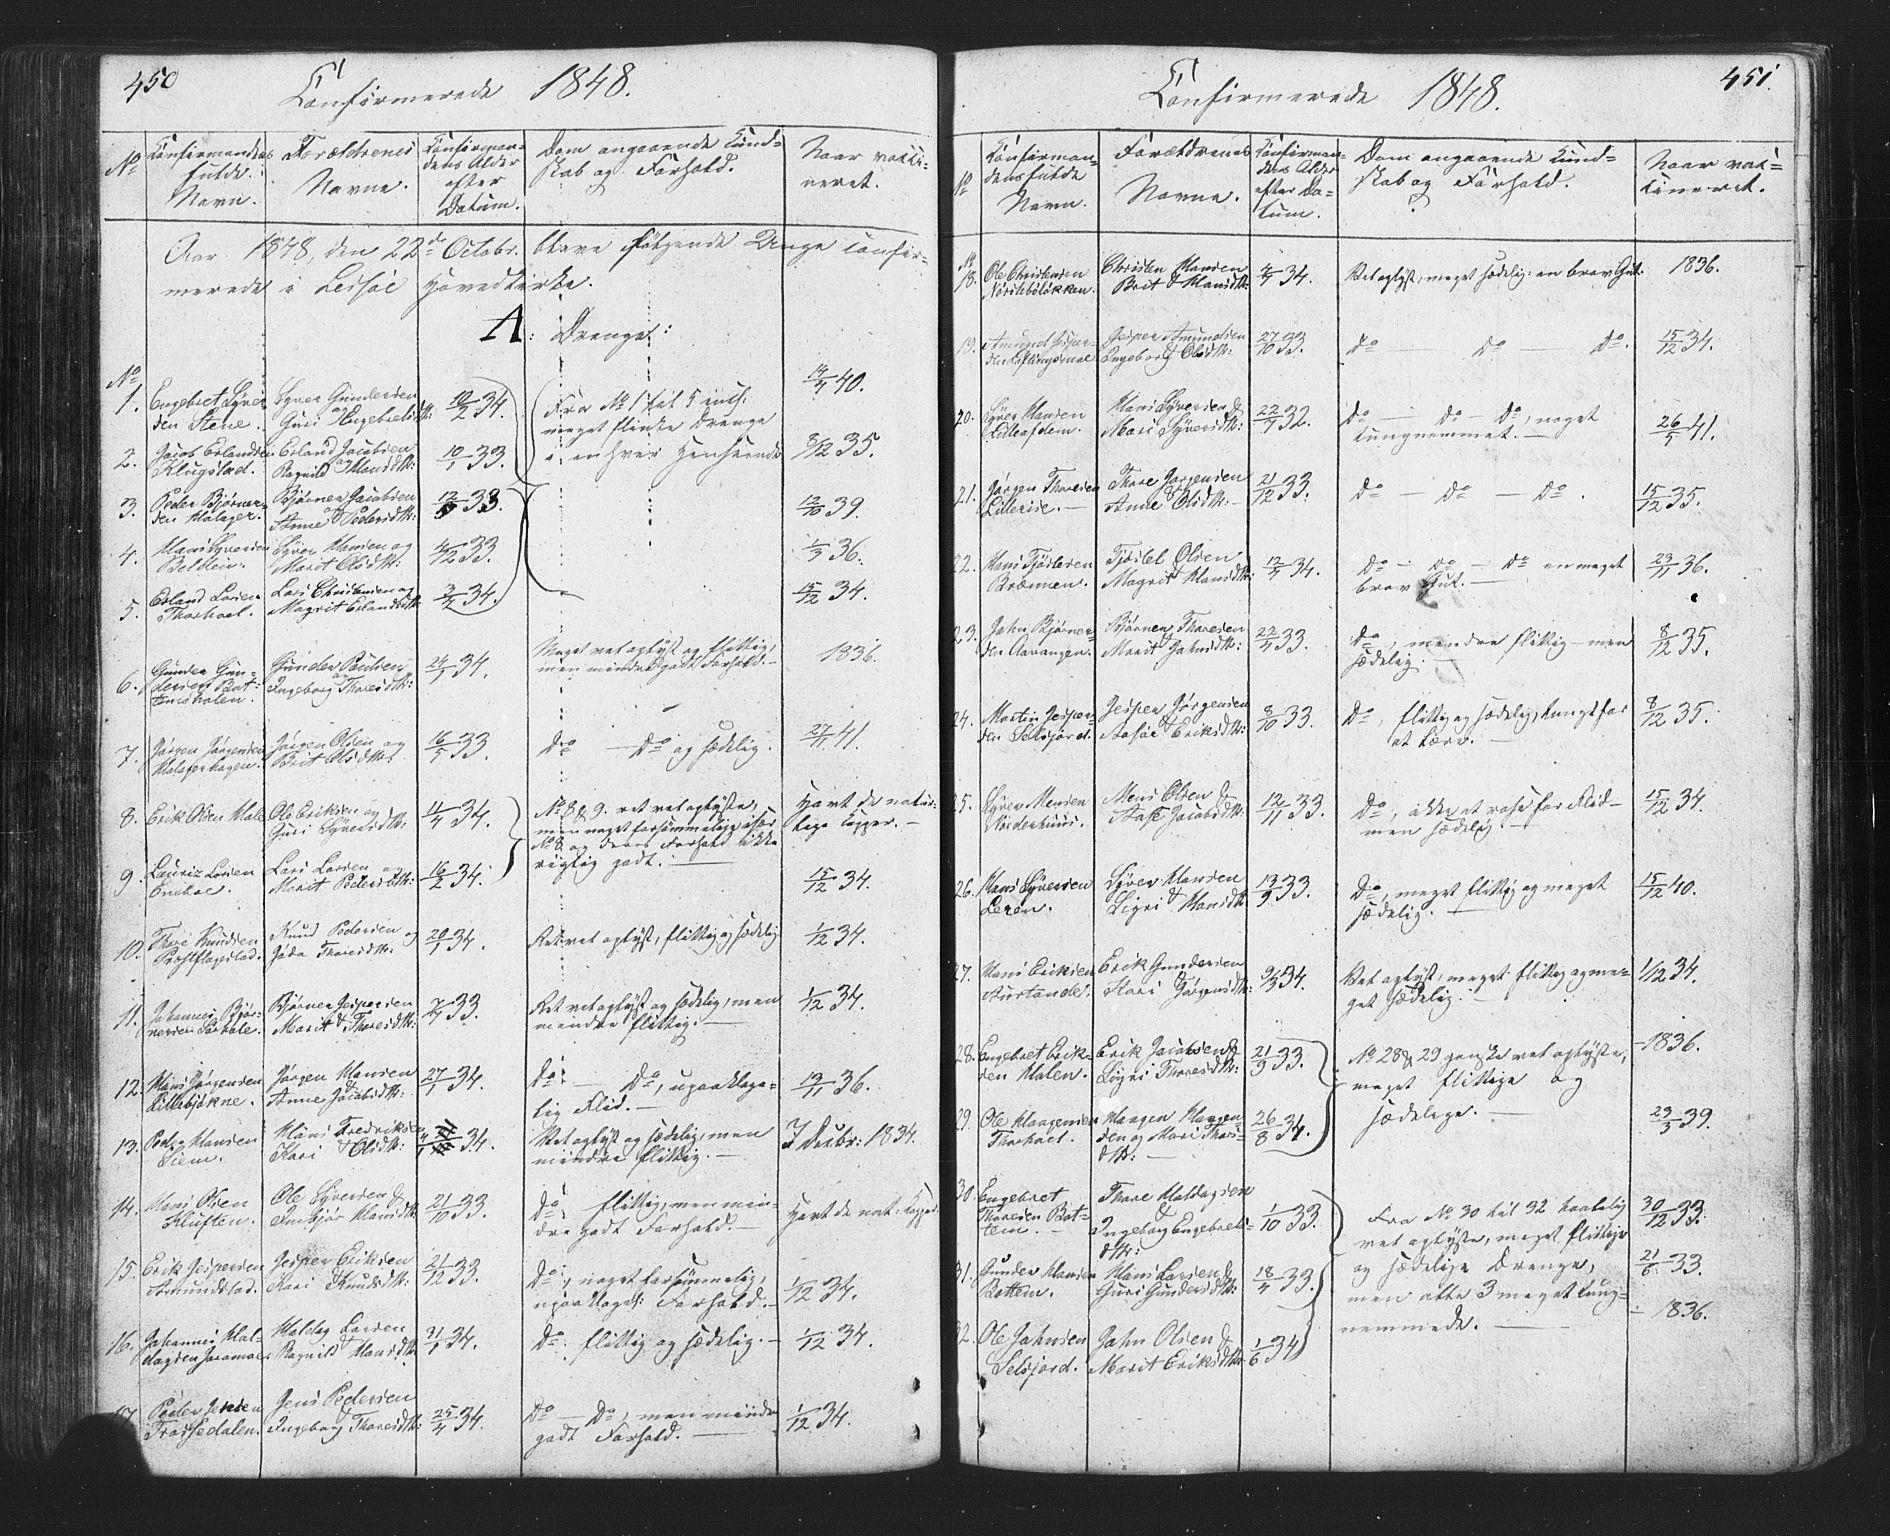 SAH, Lesja prestekontor, Klokkerbok nr. 2, 1832-1850, s. 450-451